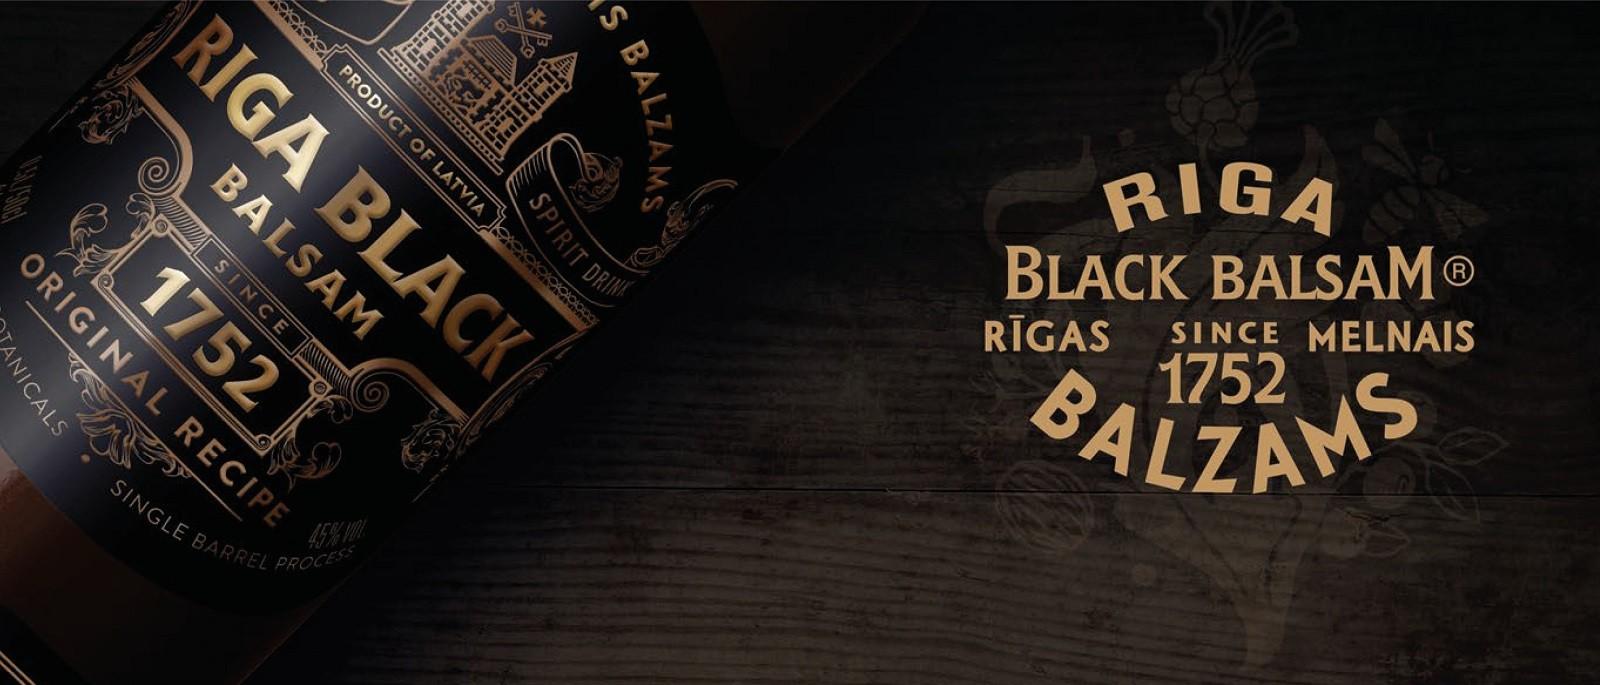 Riga Black Balsam ITA Banner